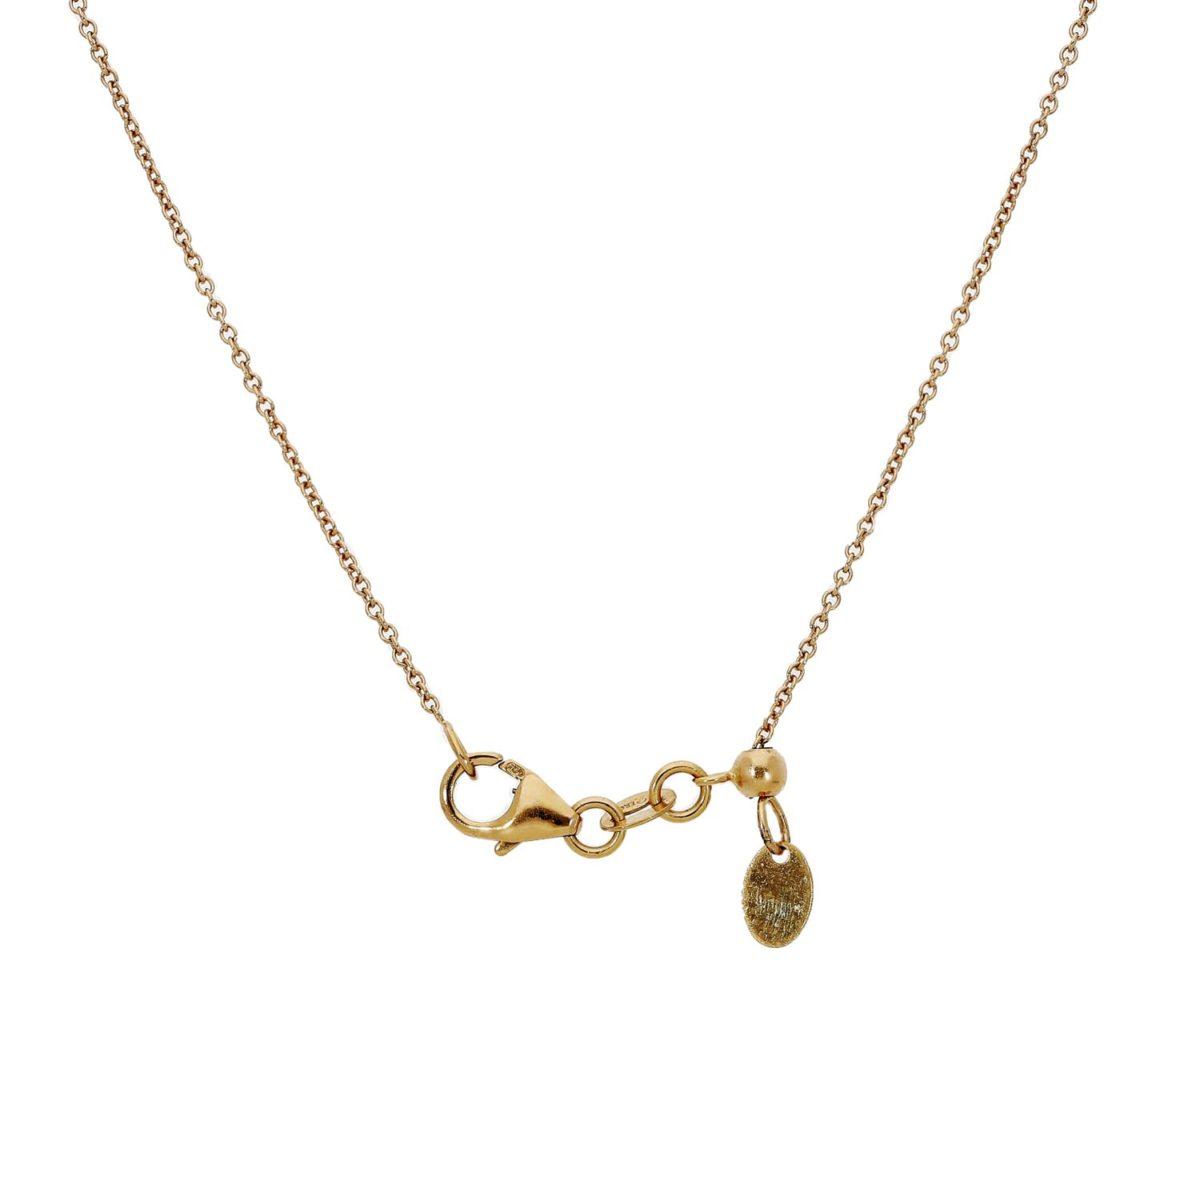 Diamond NecklaceStyle #: RIU-28903